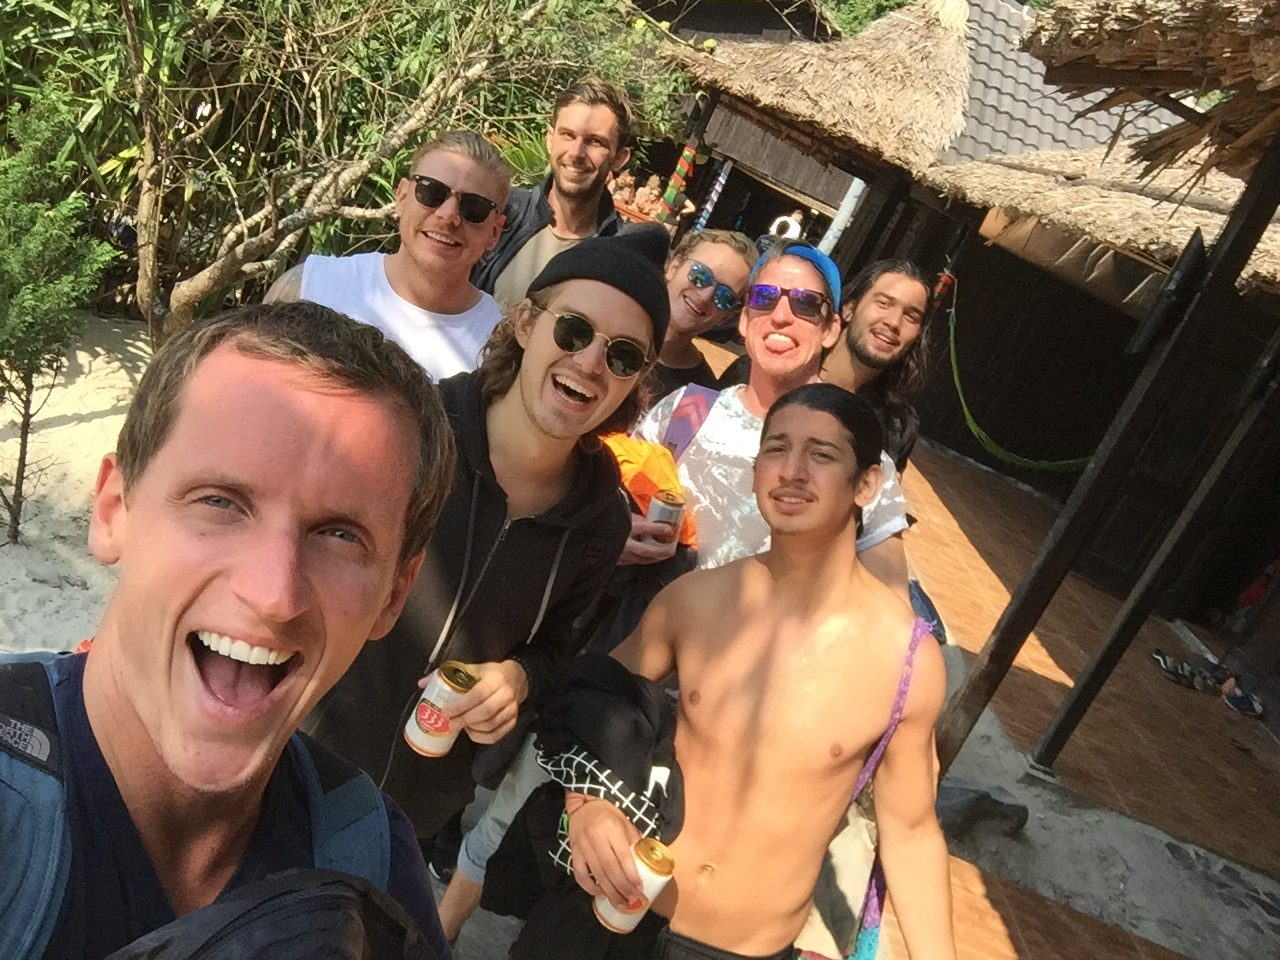 David Simpson and friends in Ha Long Bay, Vietnam. Everyone's worst travel nightmare happened today